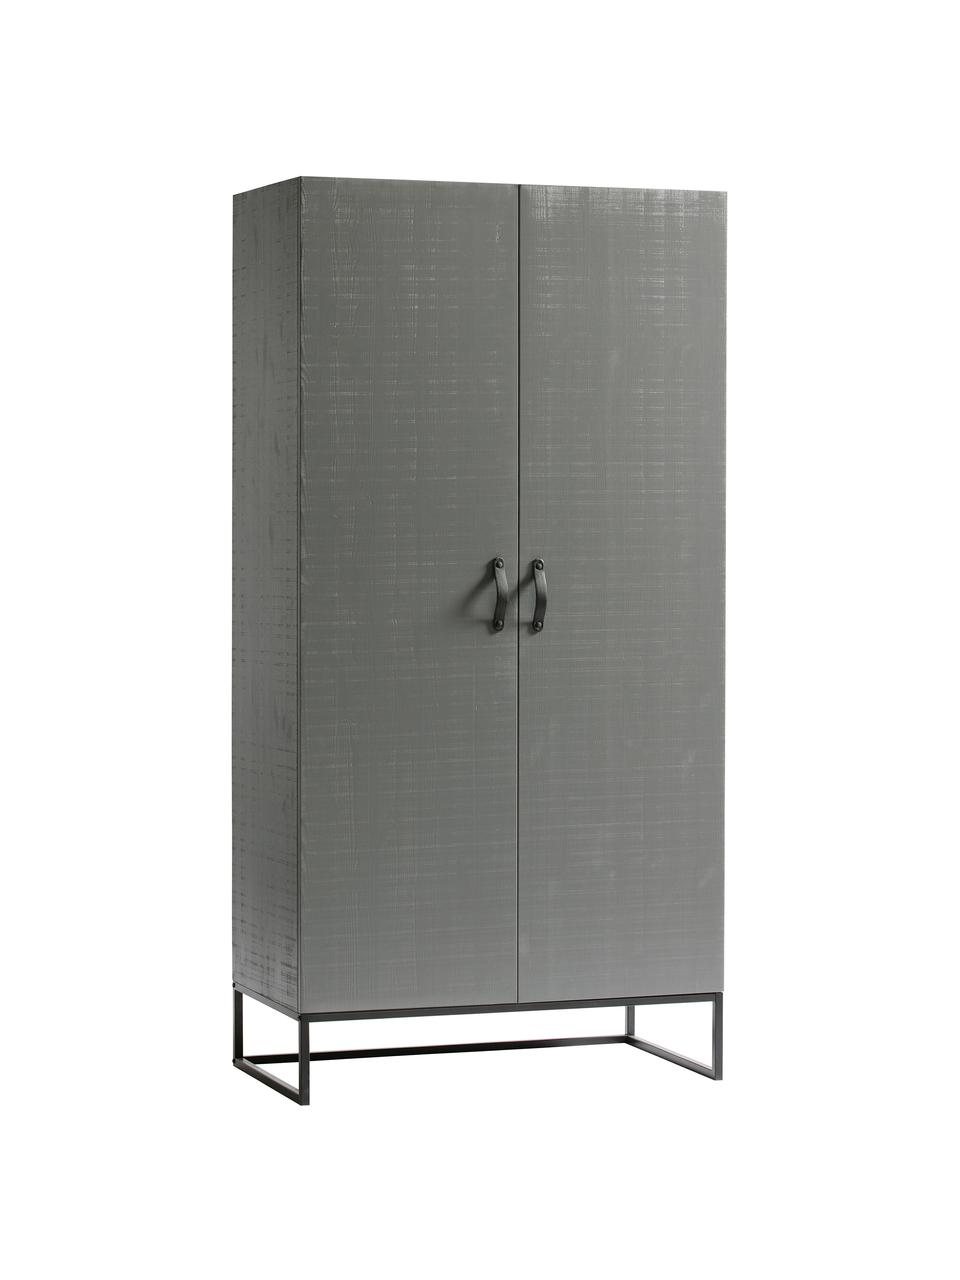 Kleiderschrank Morris in Grau, Korpus: Kiefernholz, massiv, lack, Rahmen: Metall, lackiert, Griffe: Leder, Einlegeböden: Melamin, Grau, 100 x 195 cm